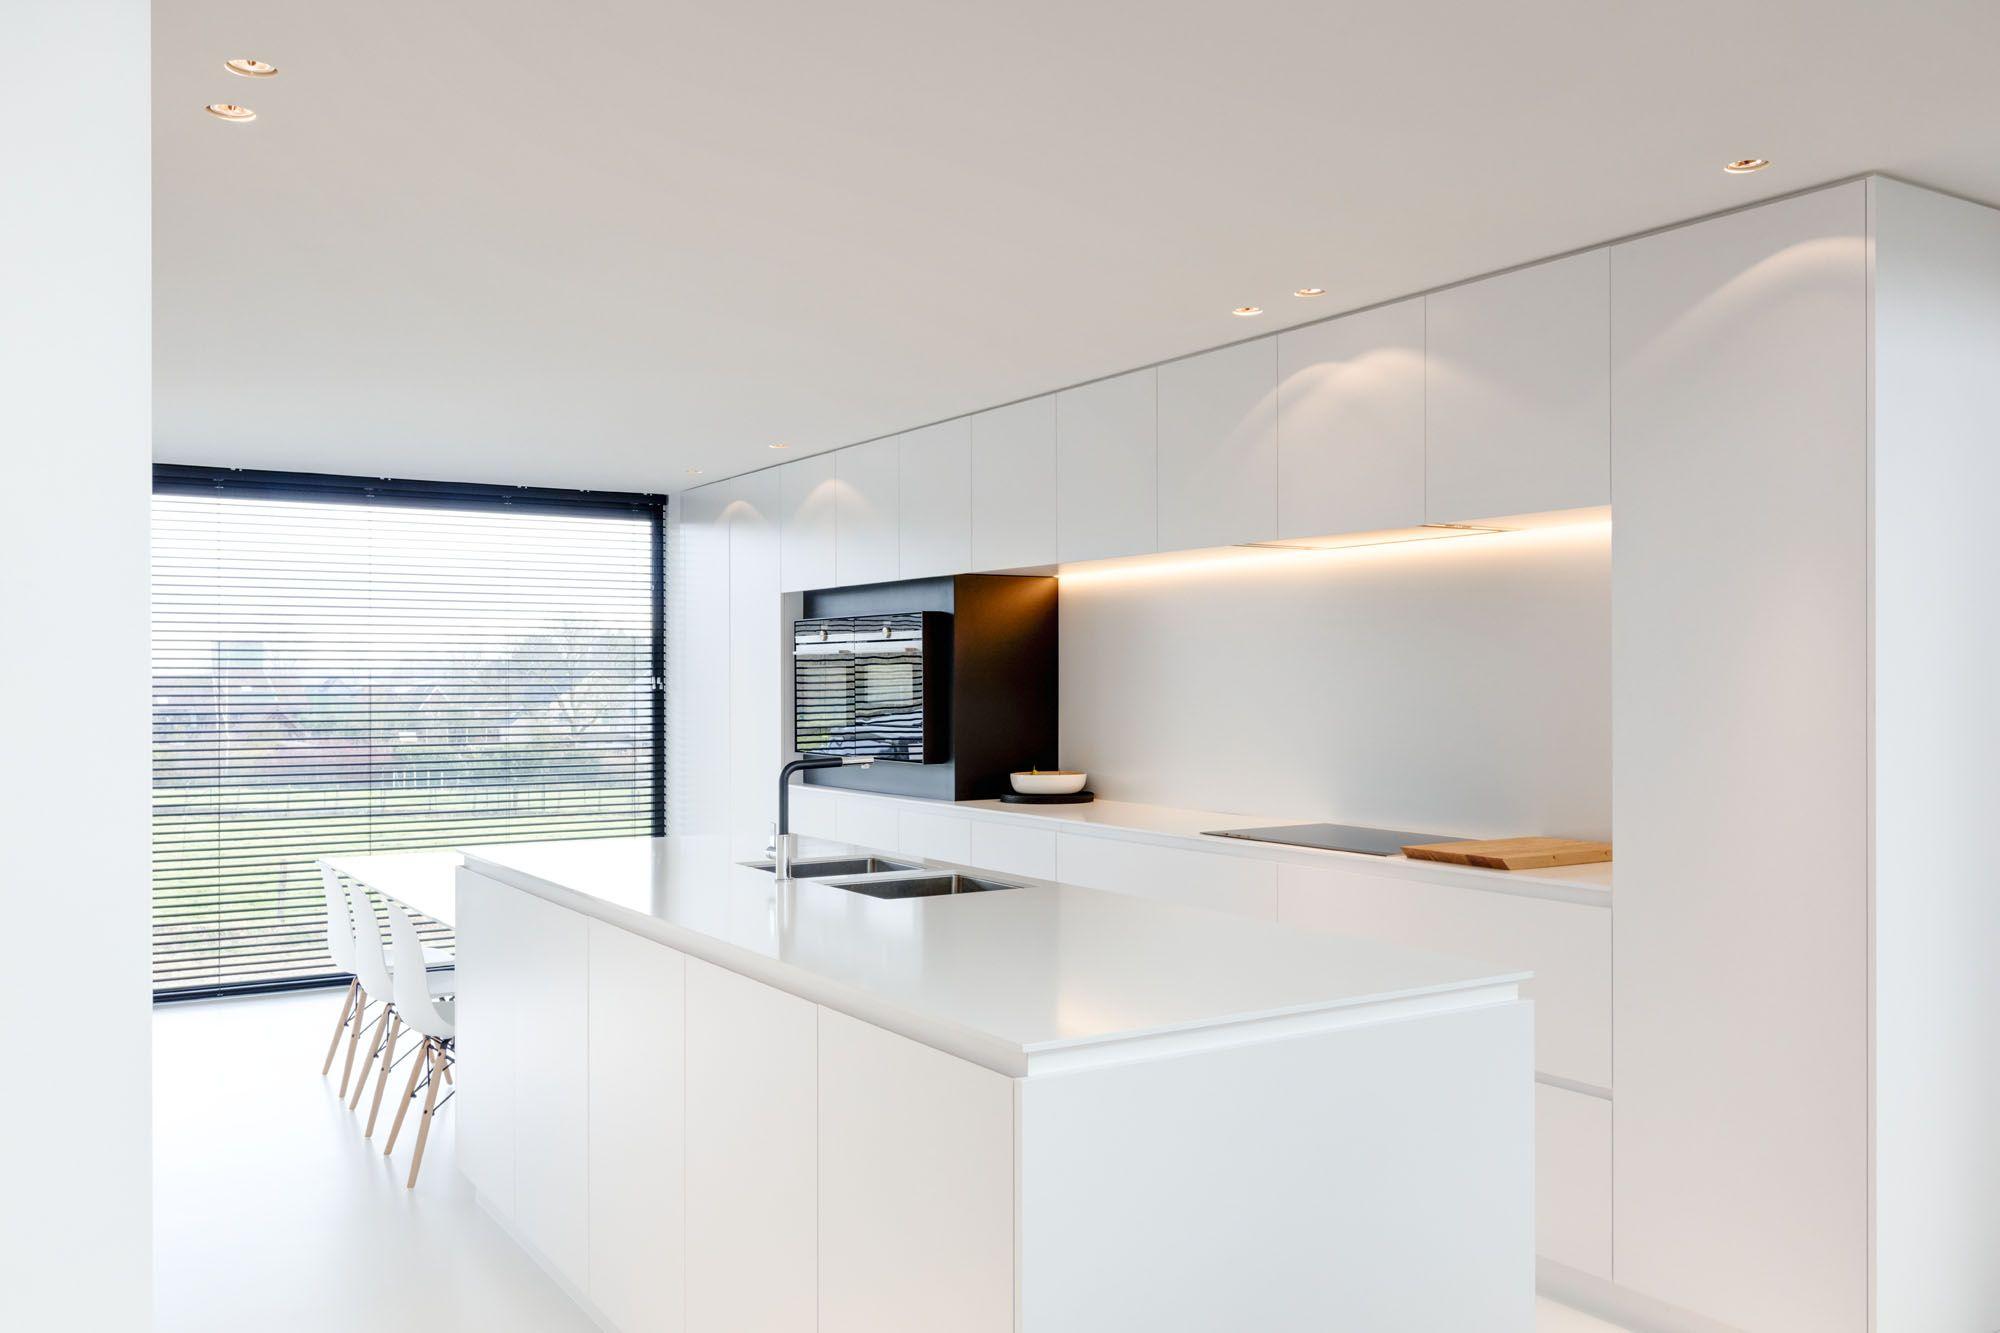 Keuken Witte Kleine : Witte gietvloer in de keuken. keukens pinterest küche neue